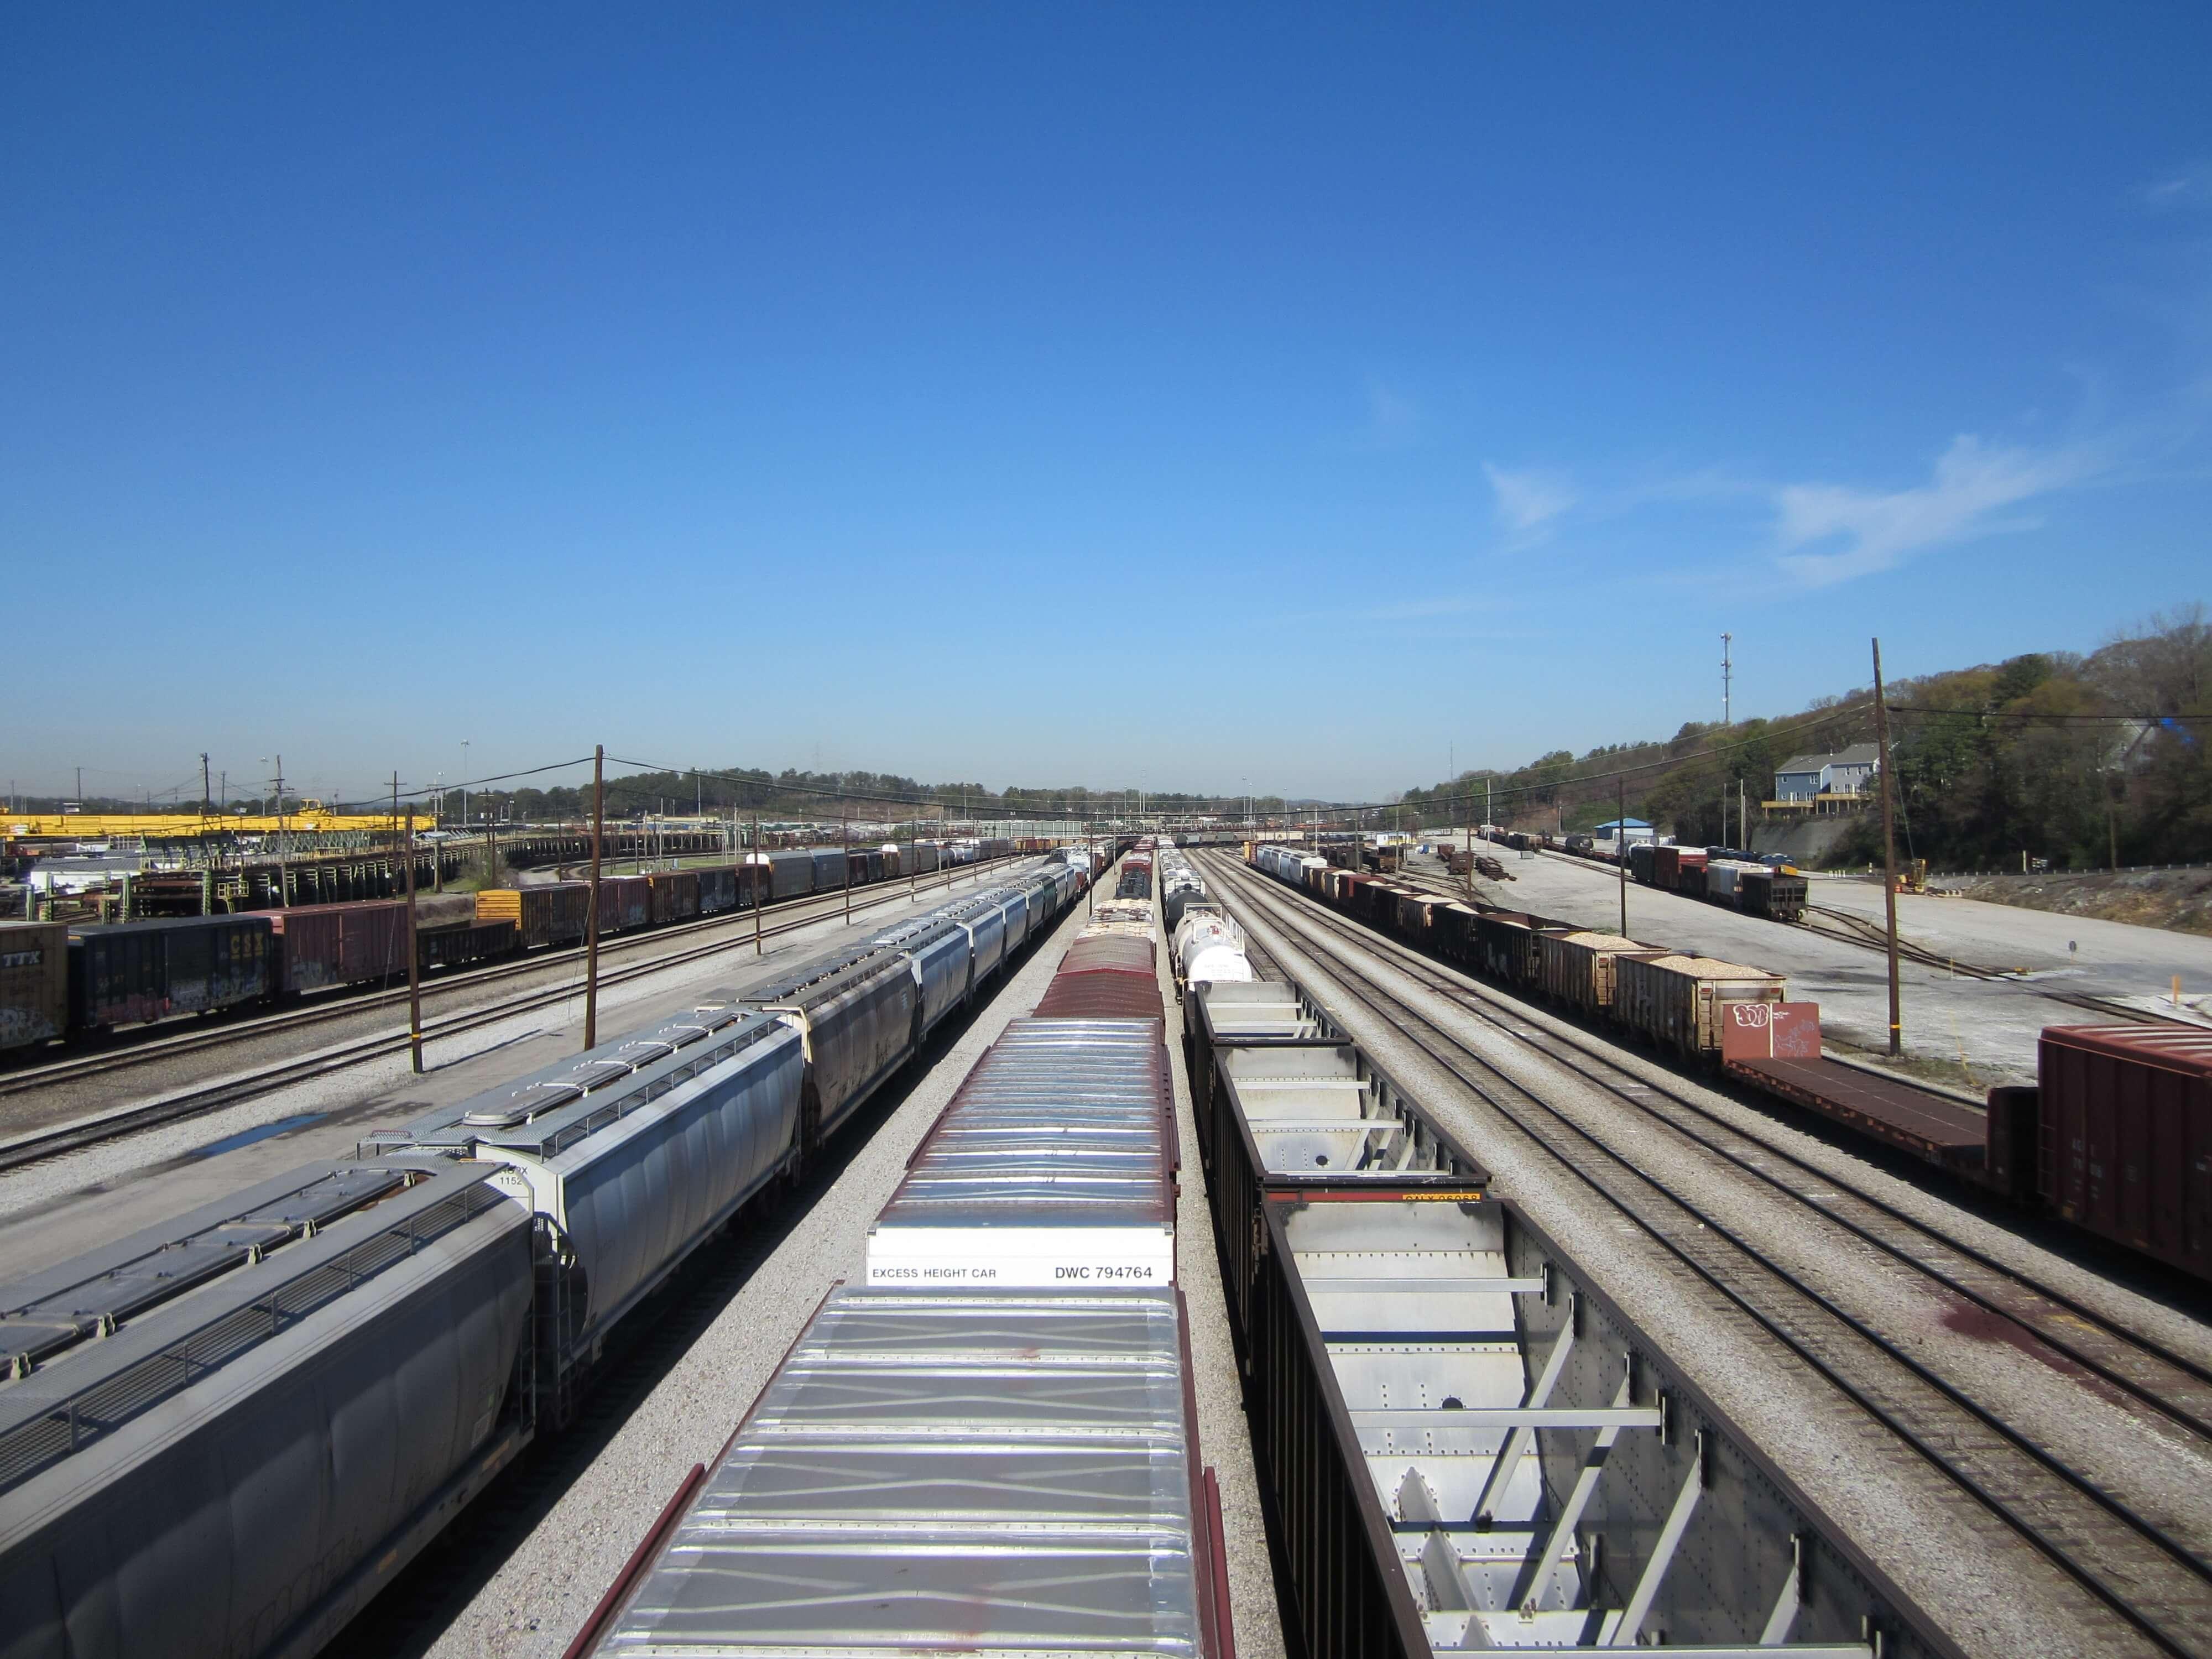 Cars On Line >> Photos of Atlanta's Downtown Railroads - Nate Shivar